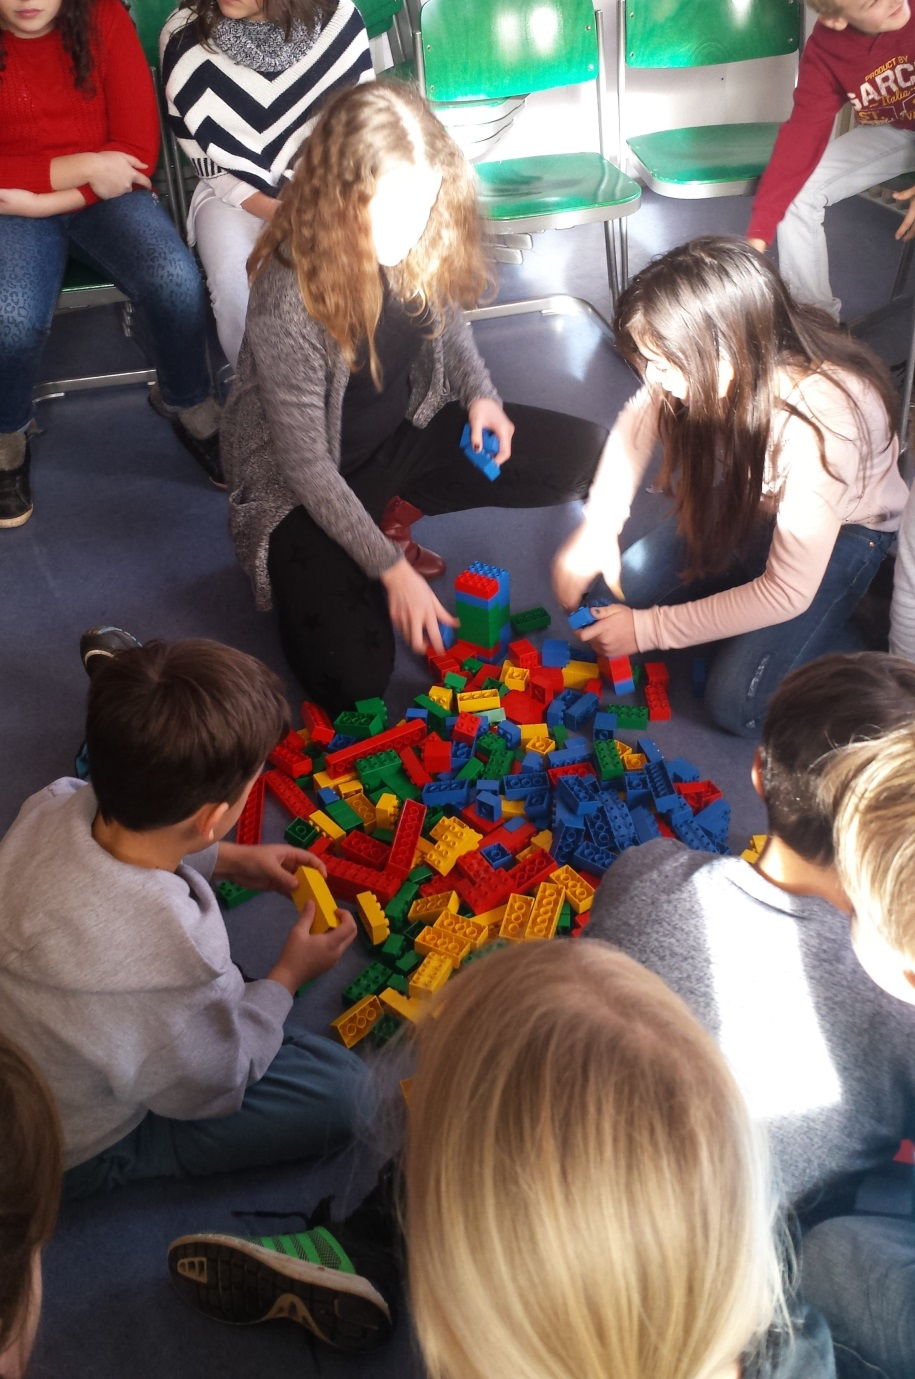 Wir bauen den größten LEGO Turm ???